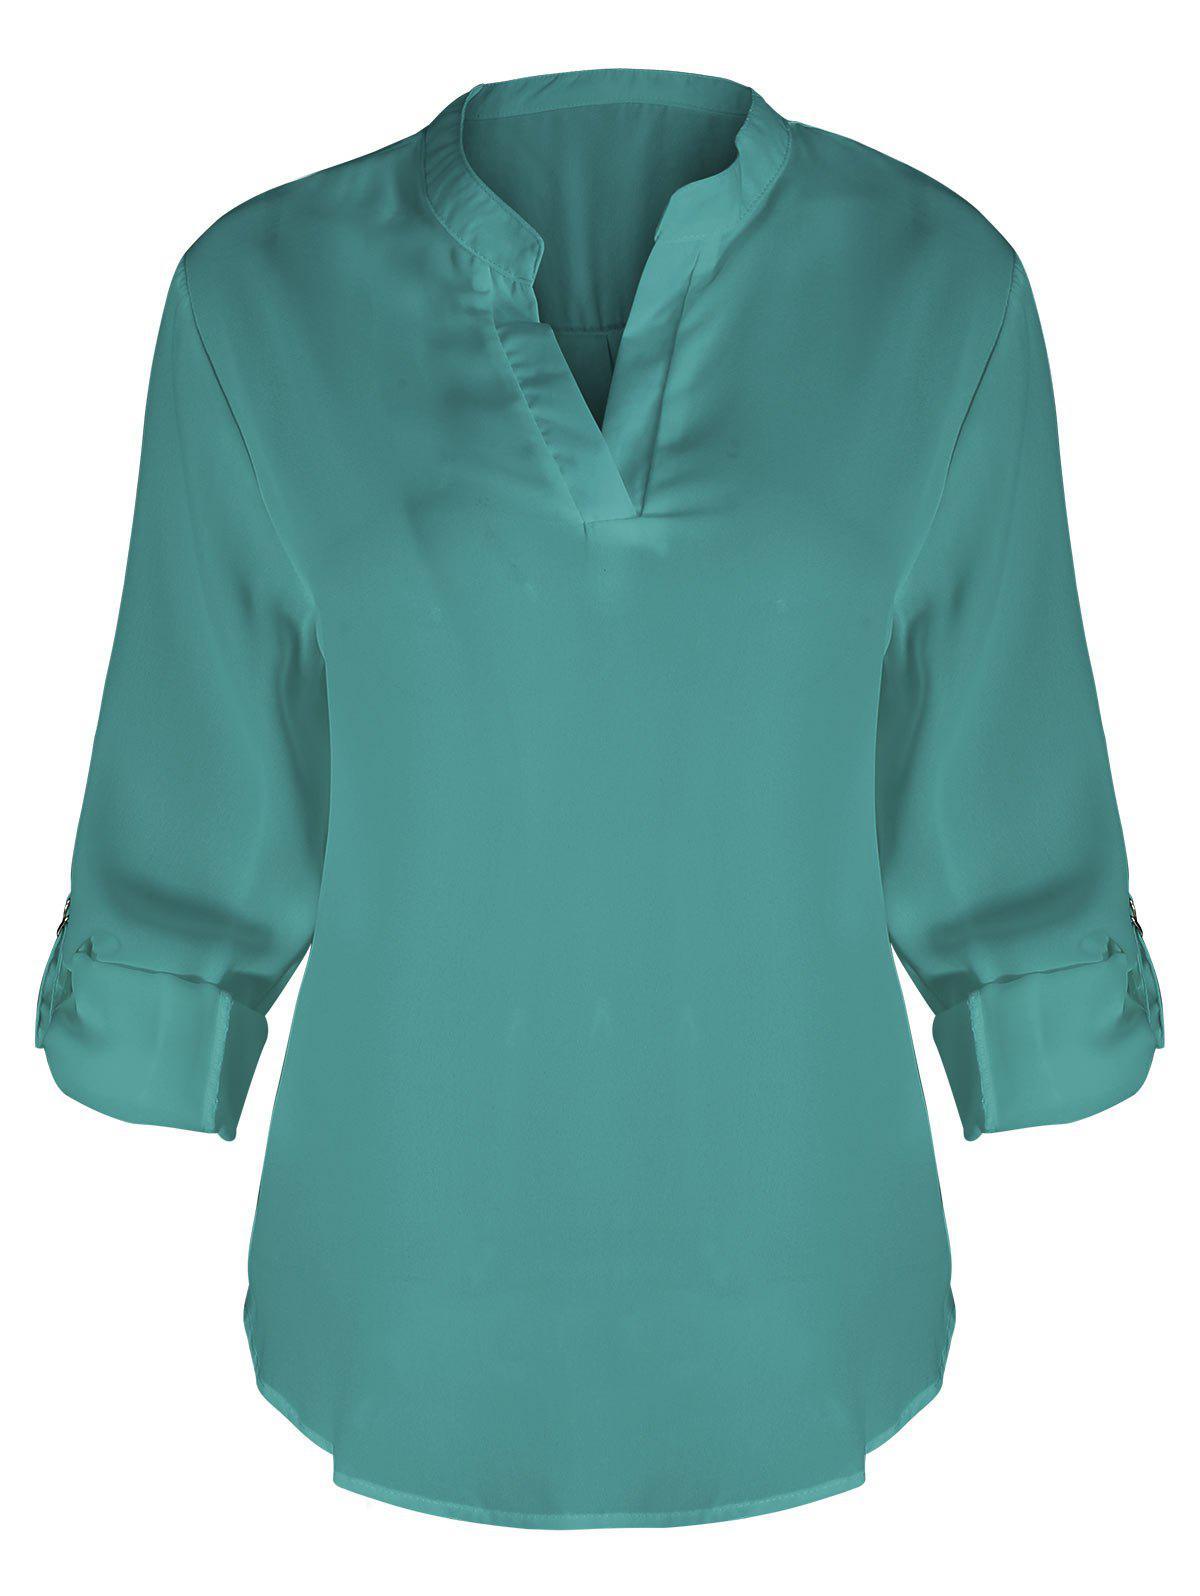 V-Ausschnitt plus Gre Bluse